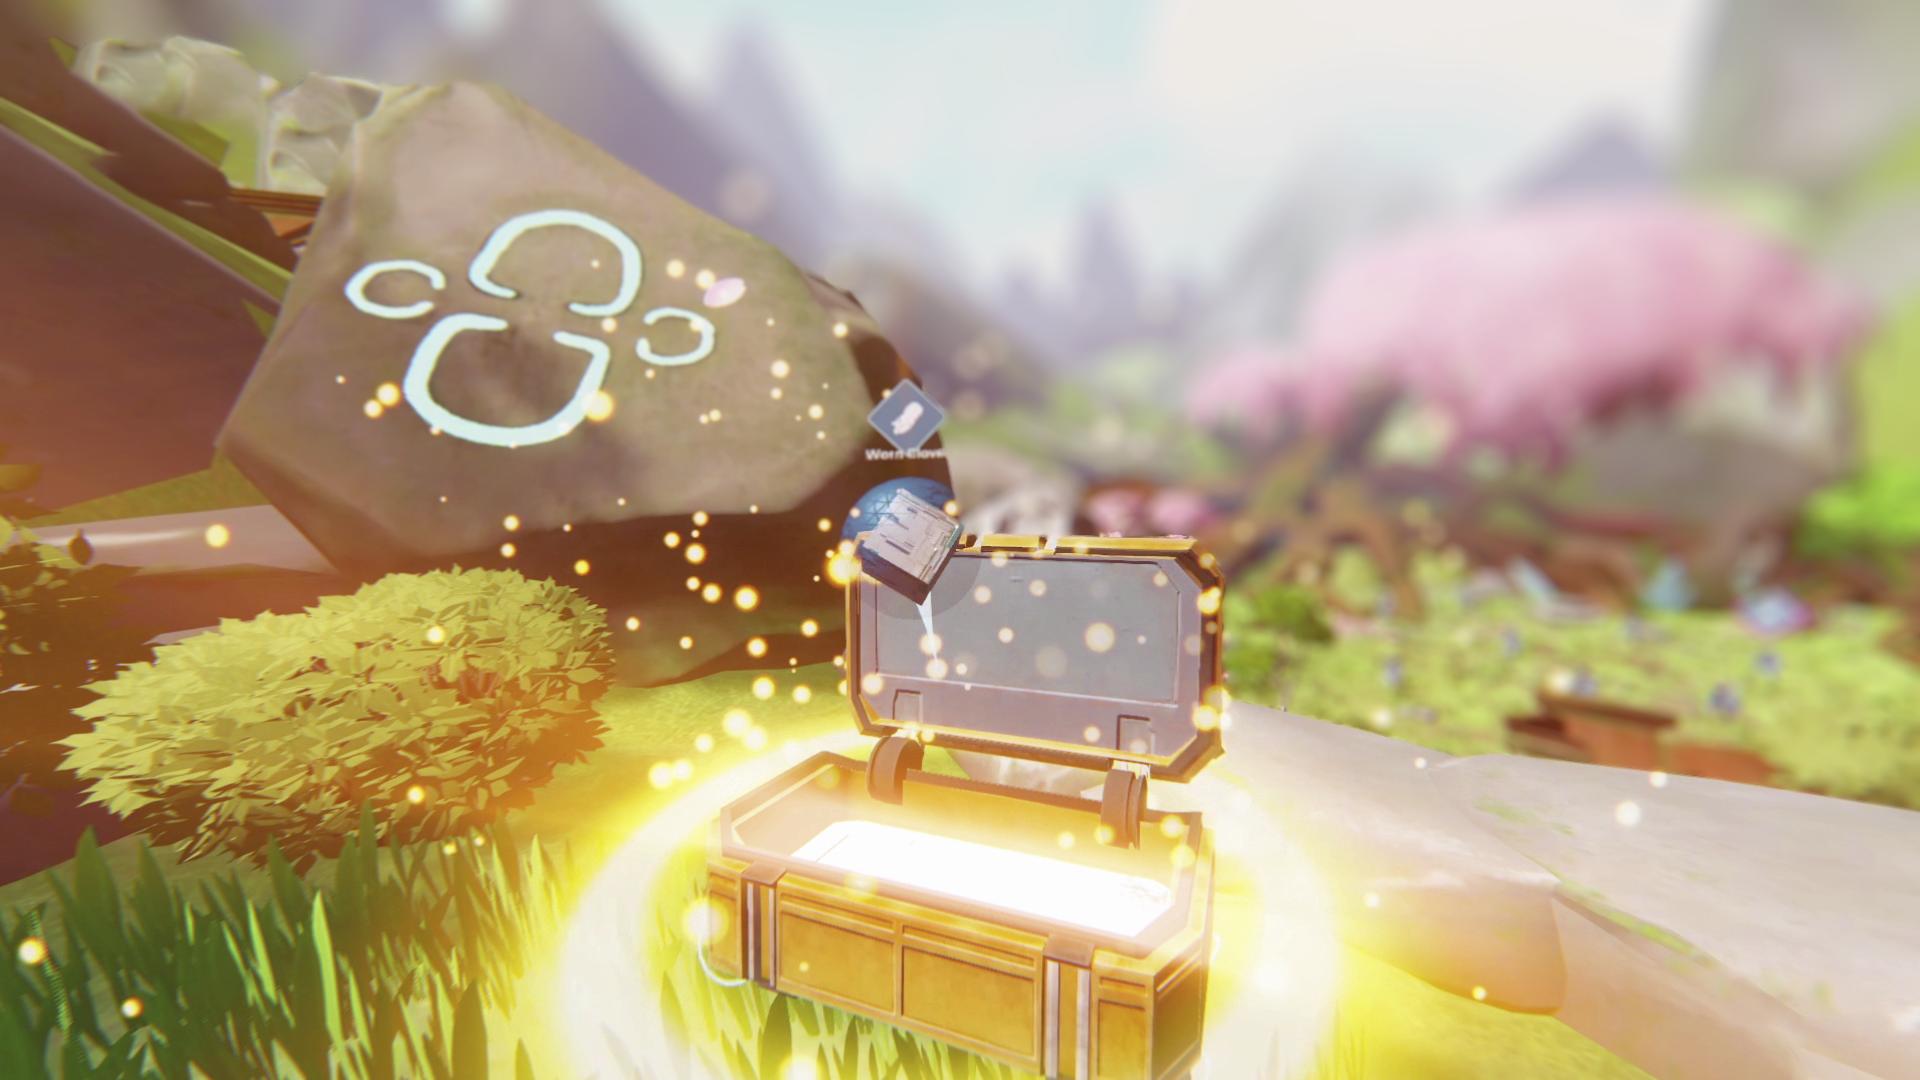 Captura de pantalla de juego de Zenith en PS VR